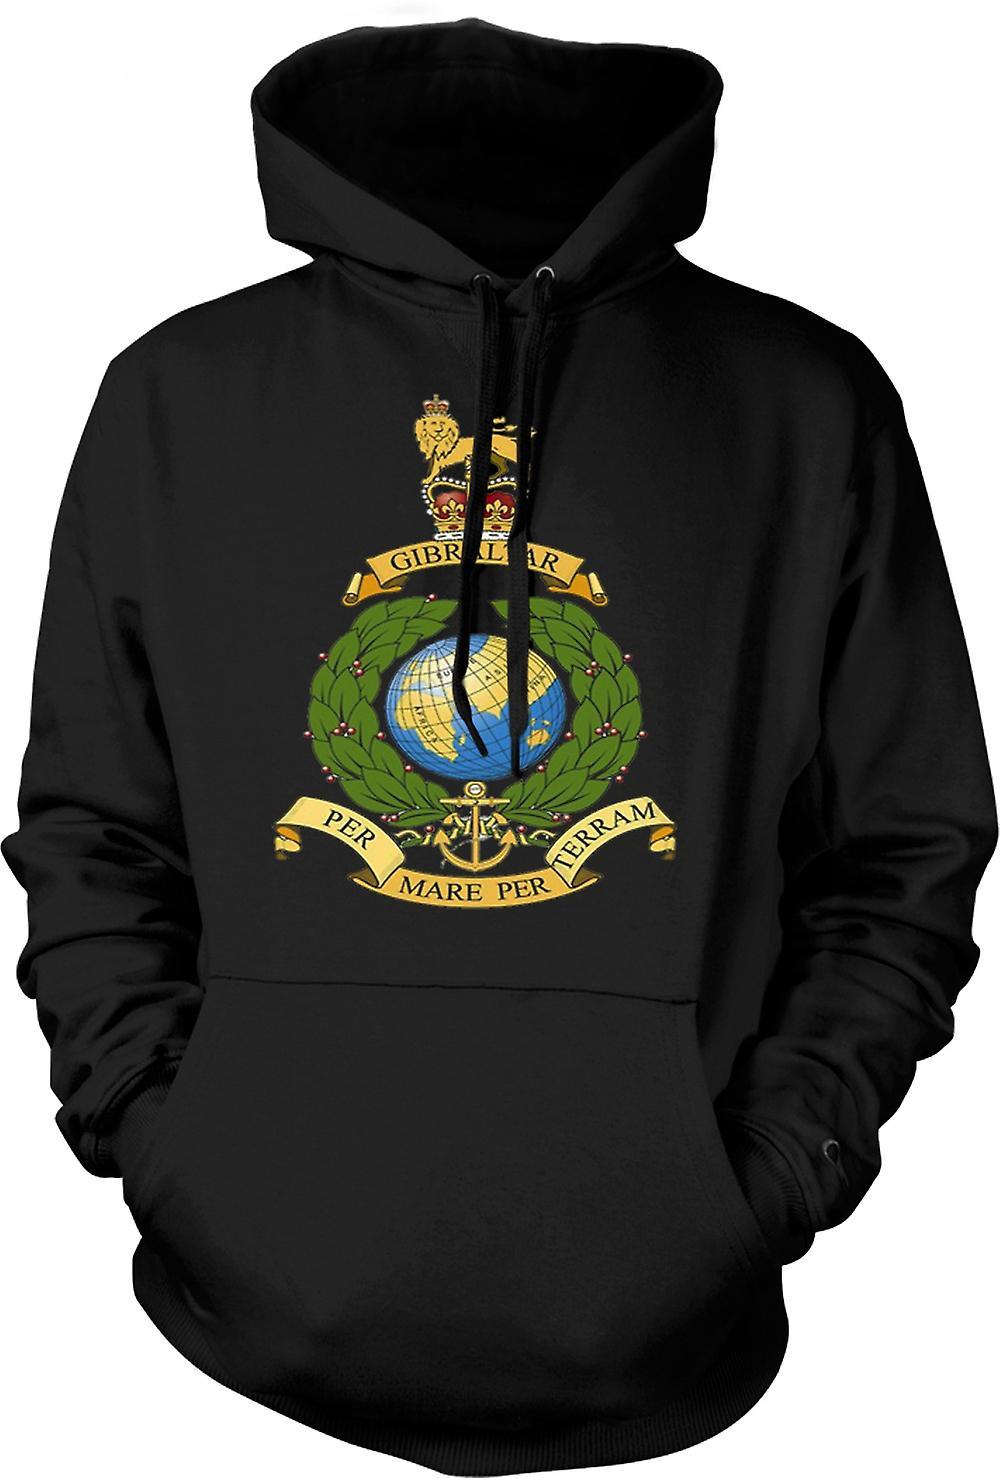 Mens Hoodie - Koninklijke Marine Logo - Per Mare Per Terram